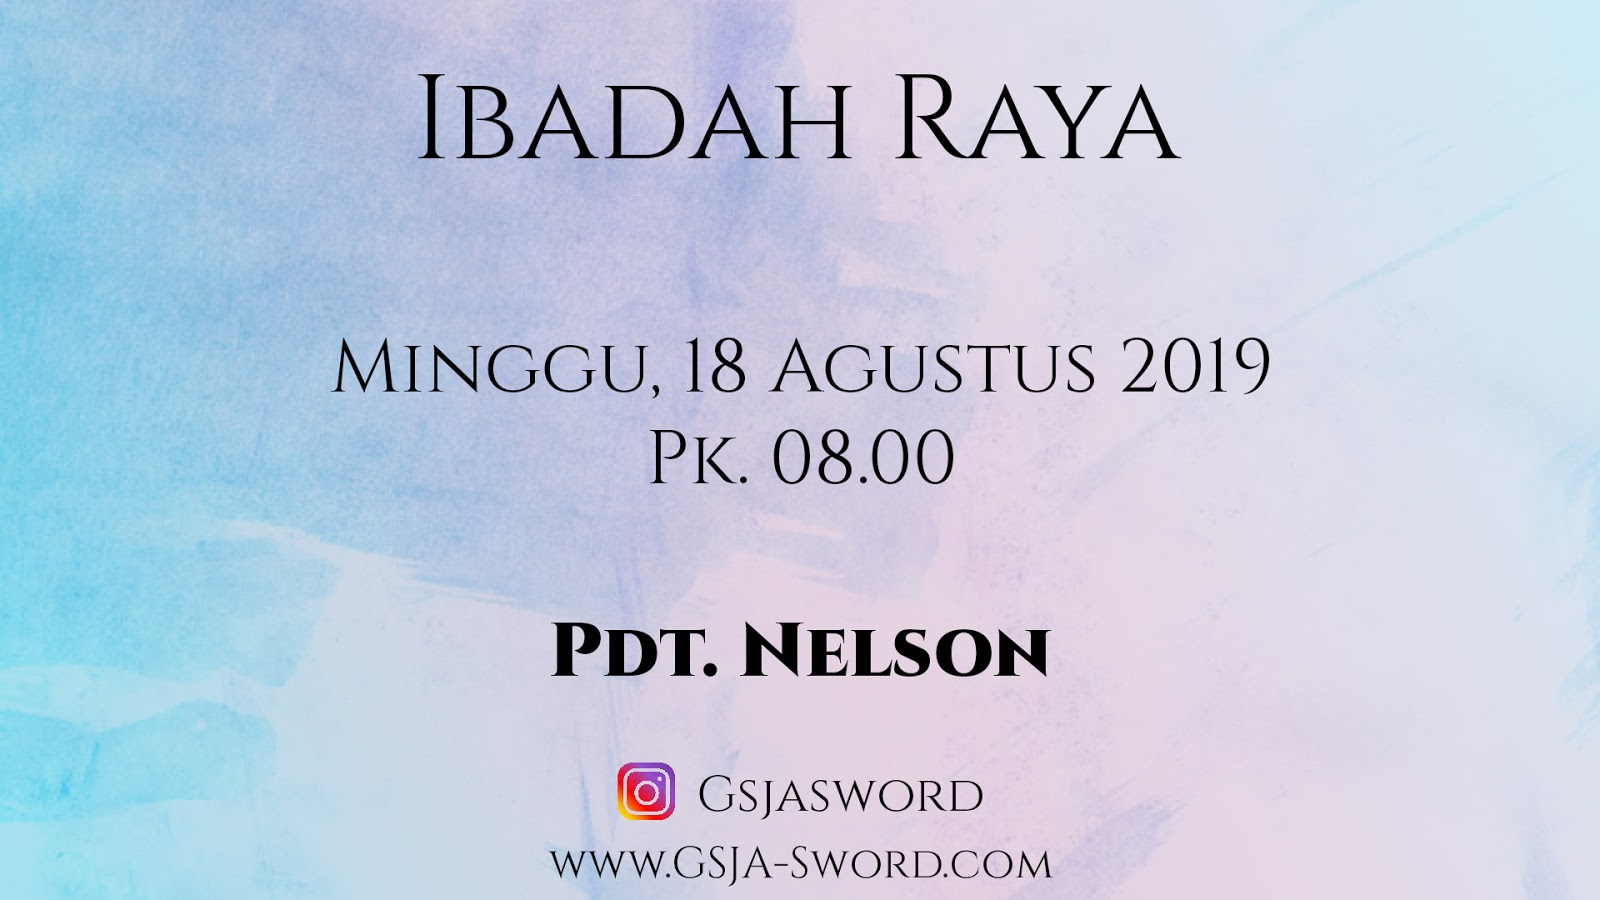 Ibadah Raya GSJA Sword Minggu 18 Agustus 2019 Jam 08.00